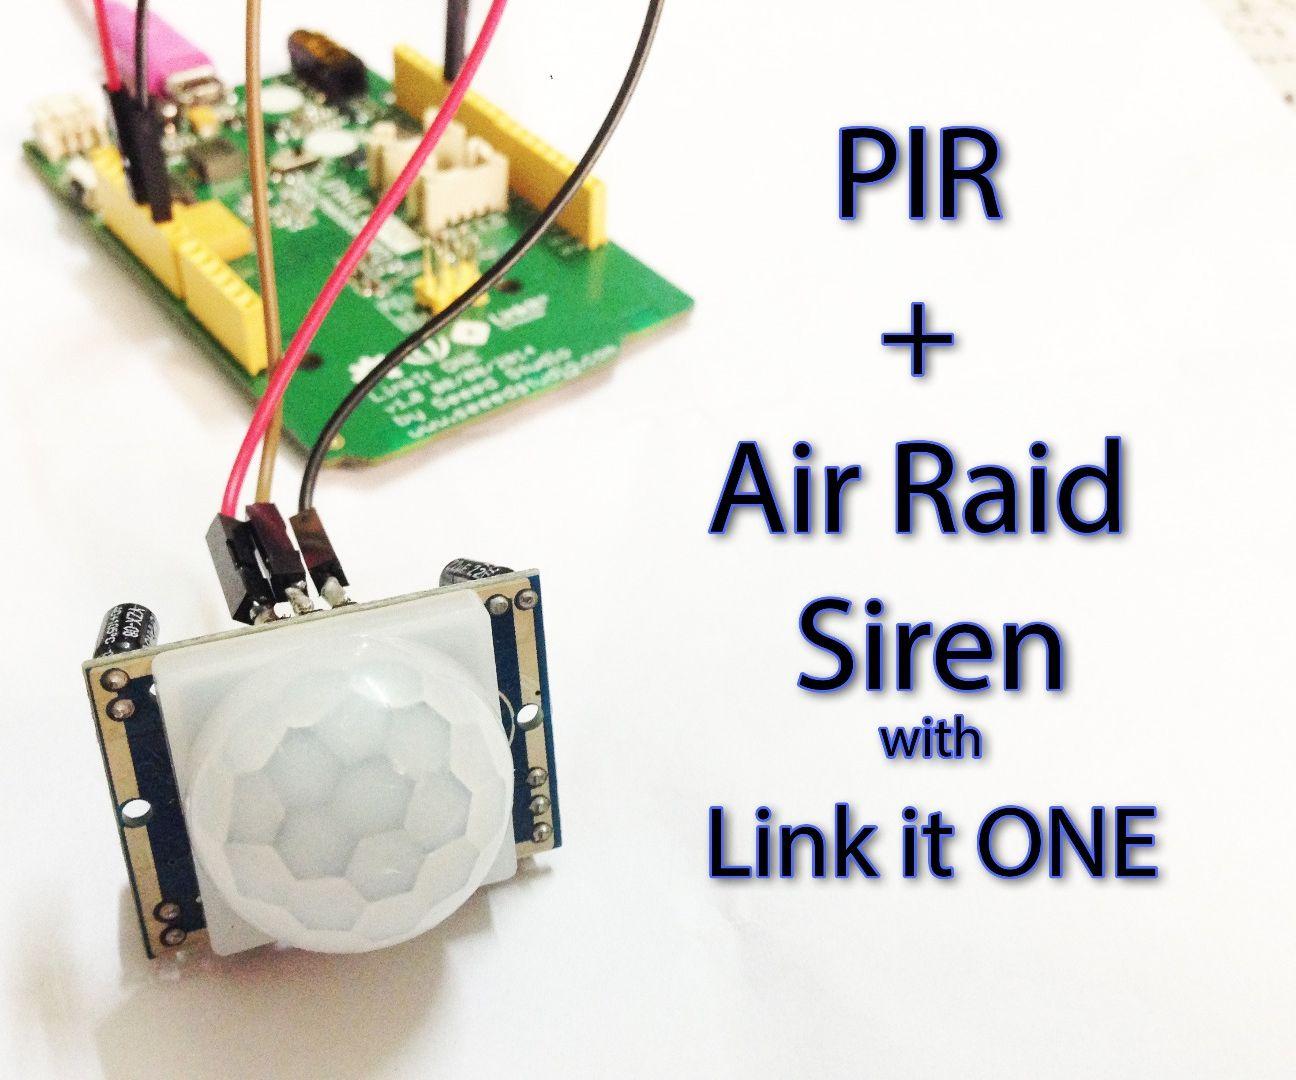 Motion Sensing Air Raid Siren with Link it ONE!